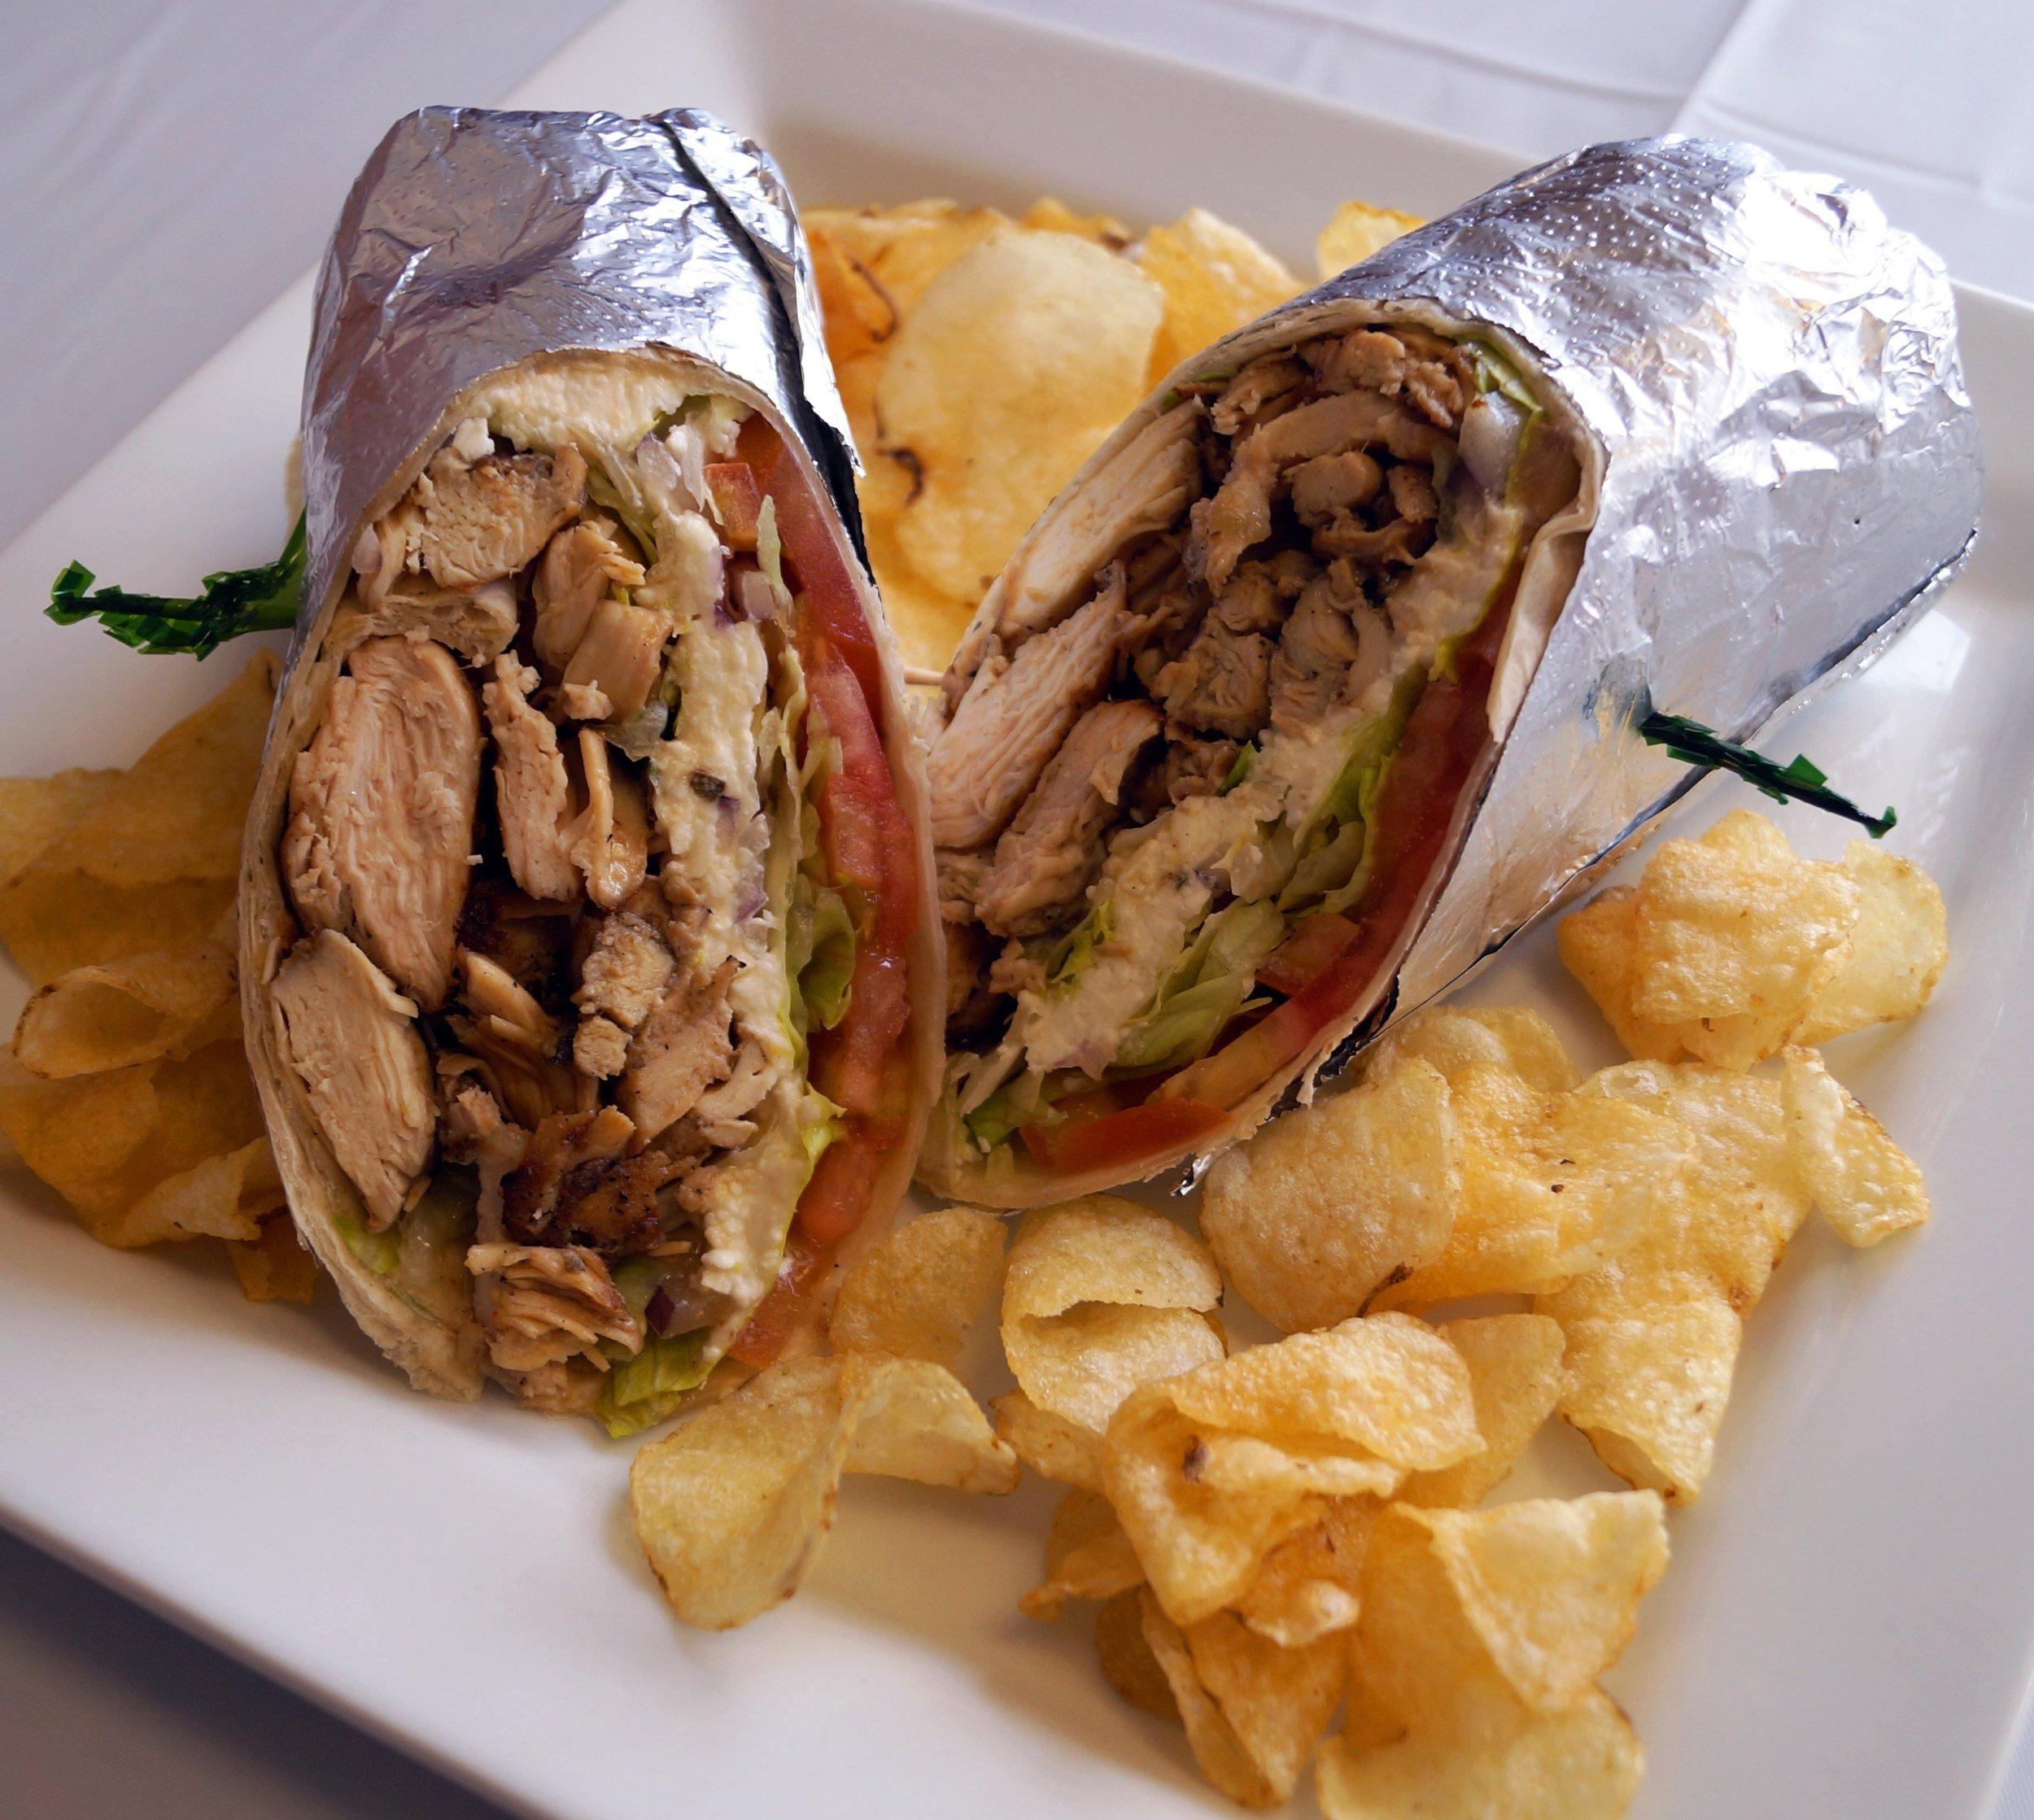 royal-roast-beef-chicken-kabob-wrap.jpg